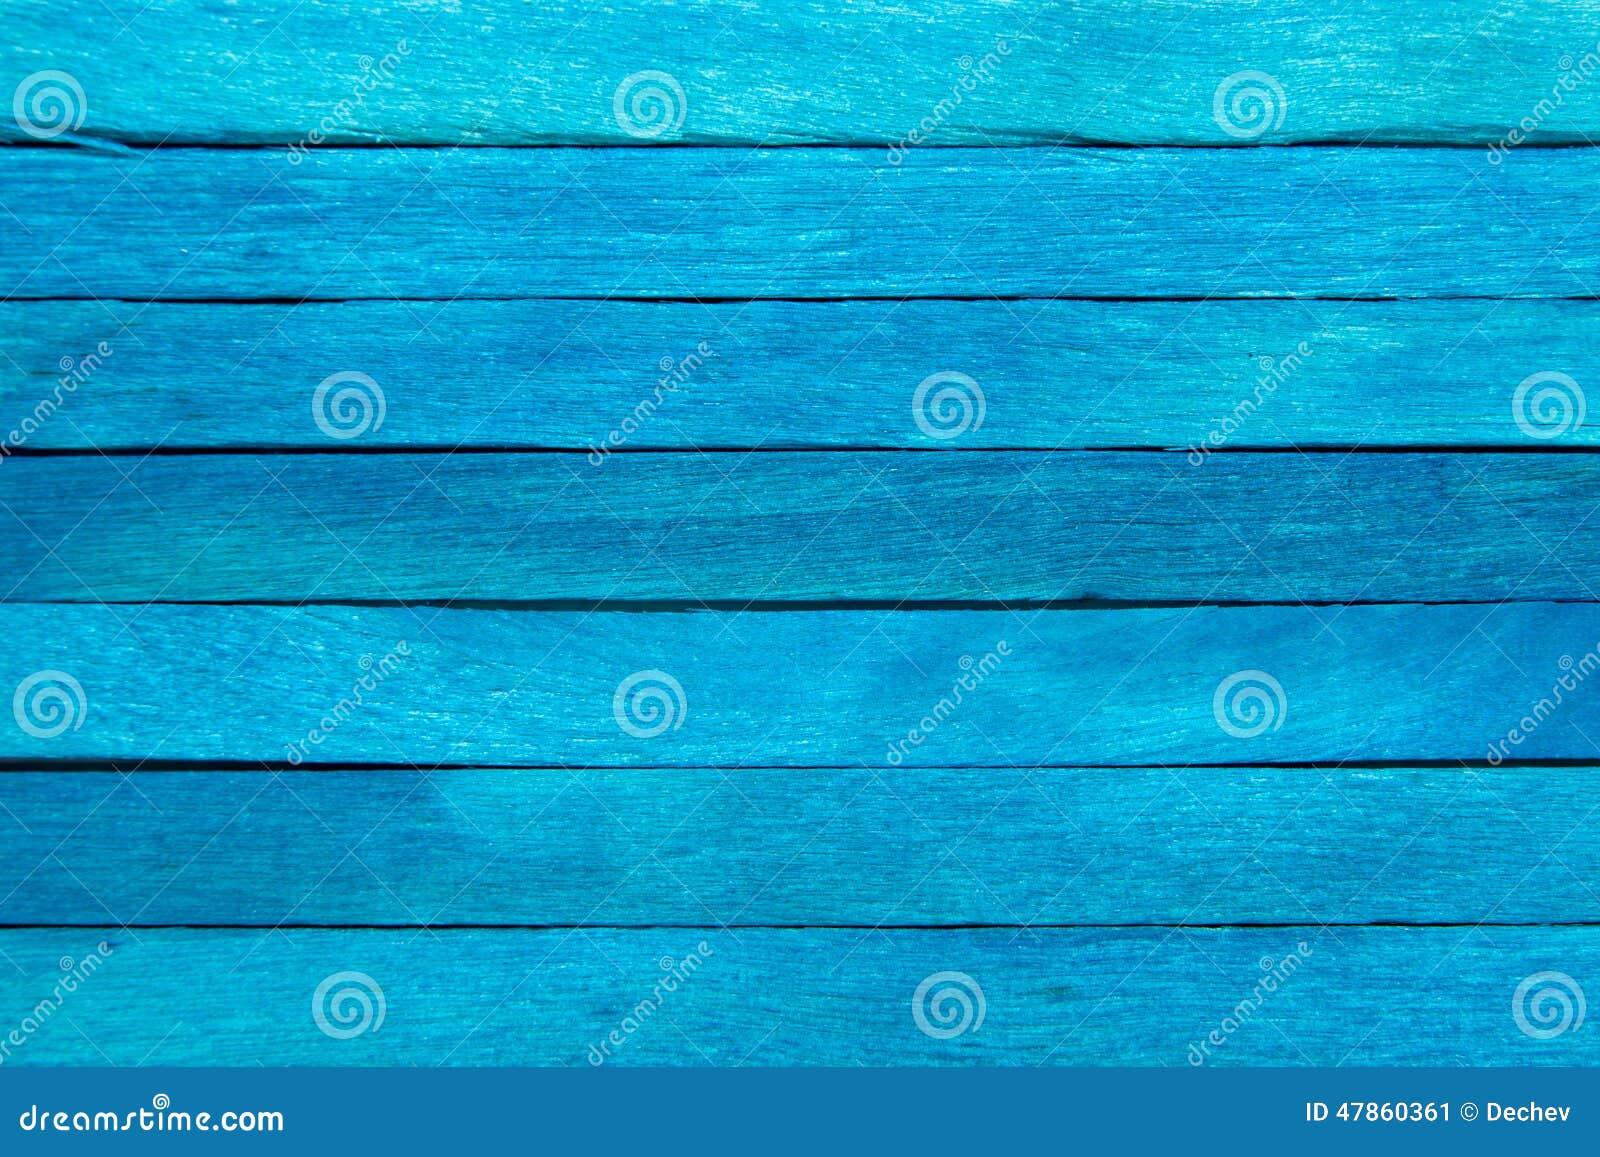 Wood plank blue background